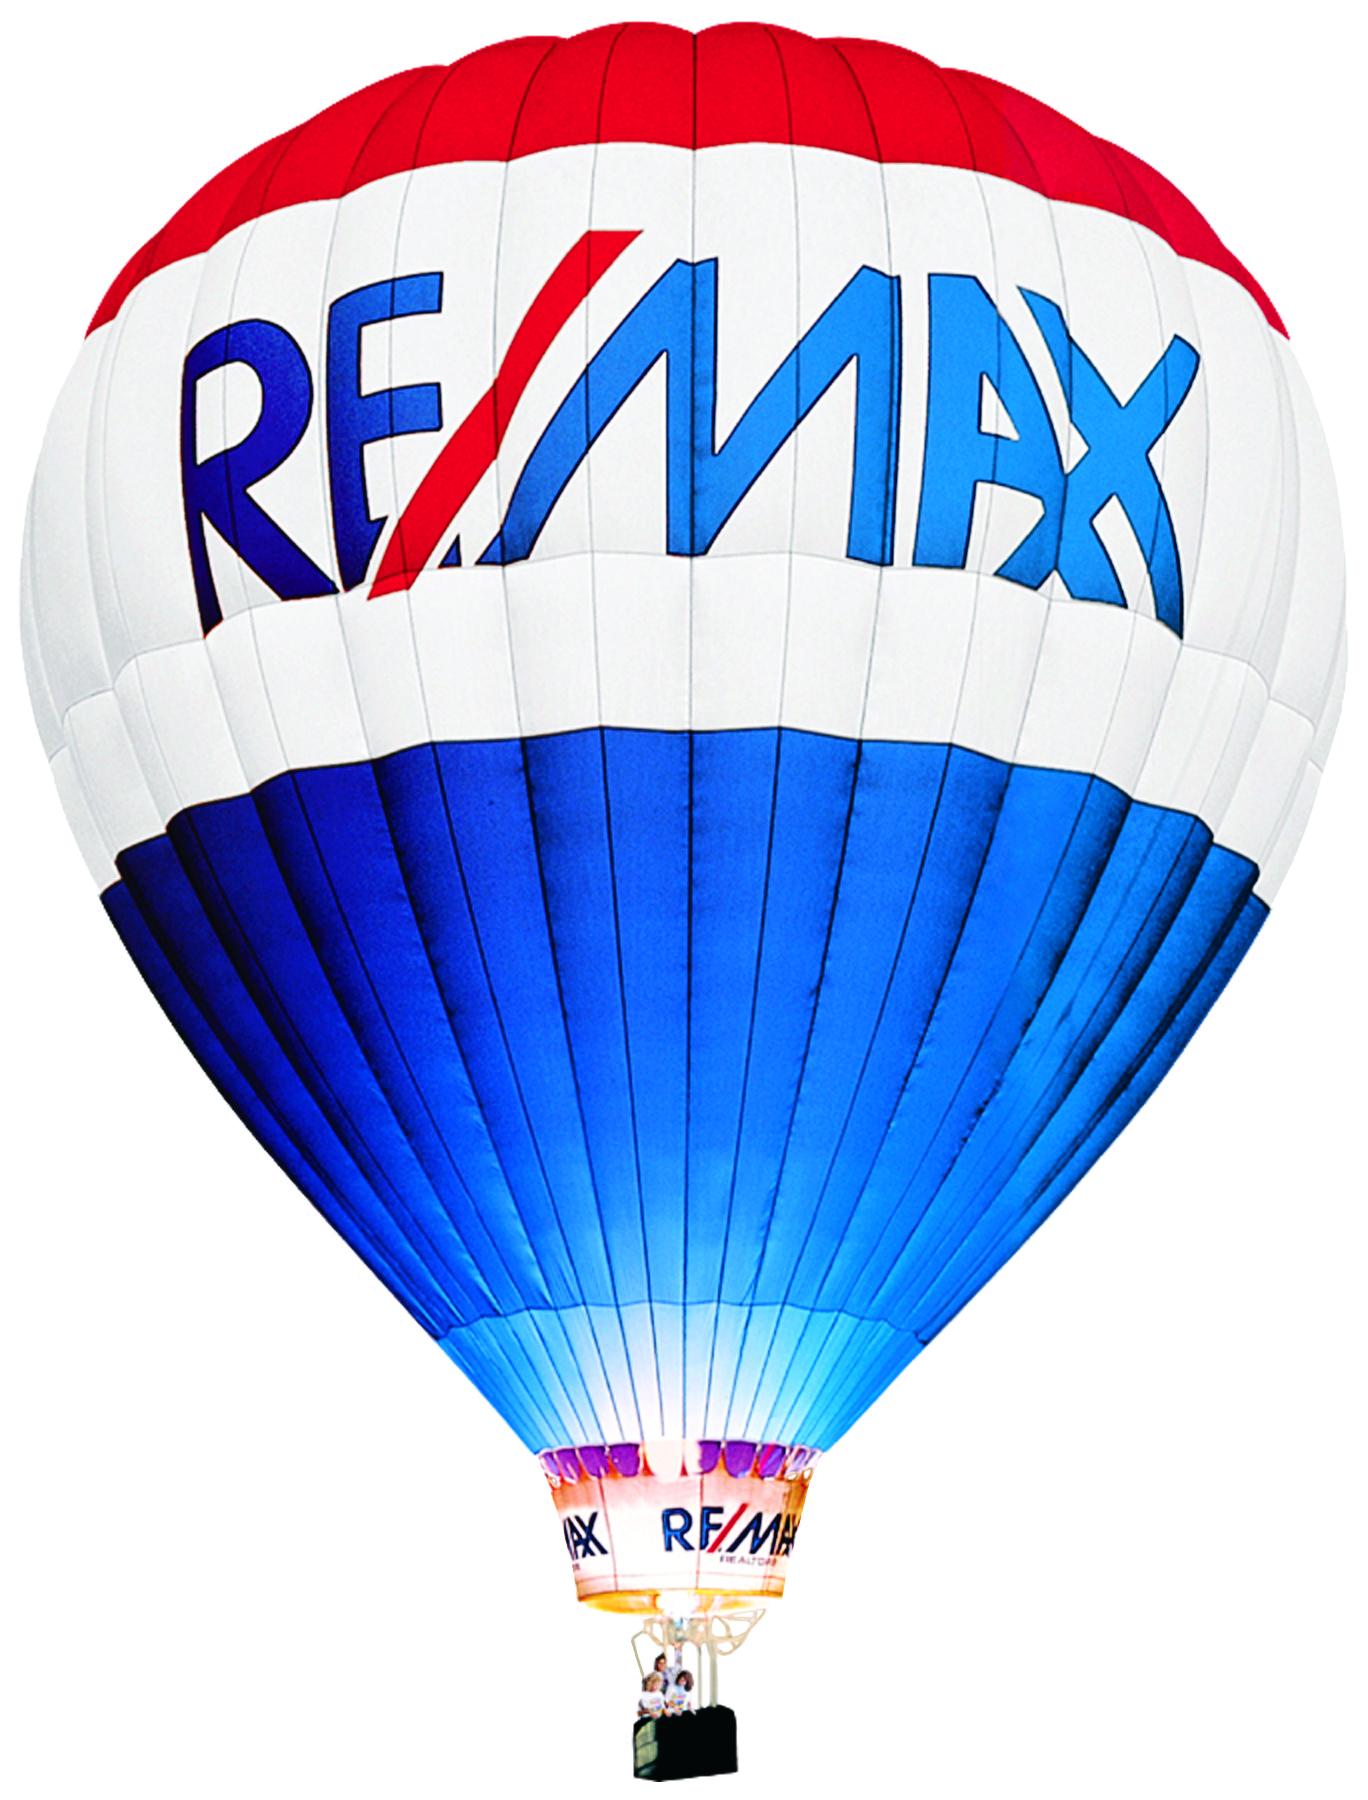 REMAX_Balloon.jpg